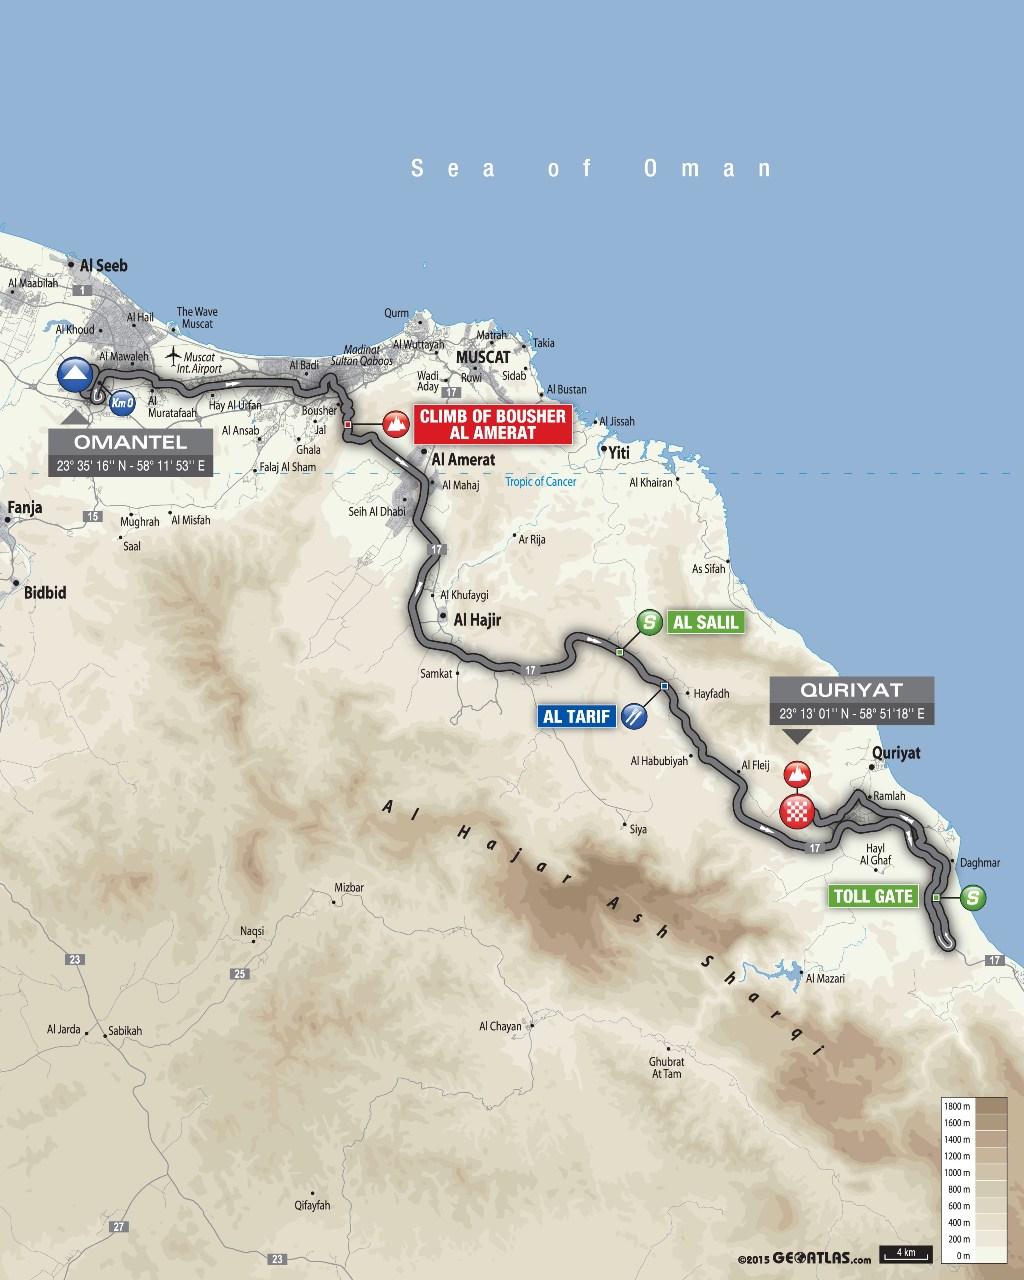 planimetria 2016 » 7th Tour of Oman (2.HC) - 2a tappa » Omantel Head Office › Quriyat (162 km)